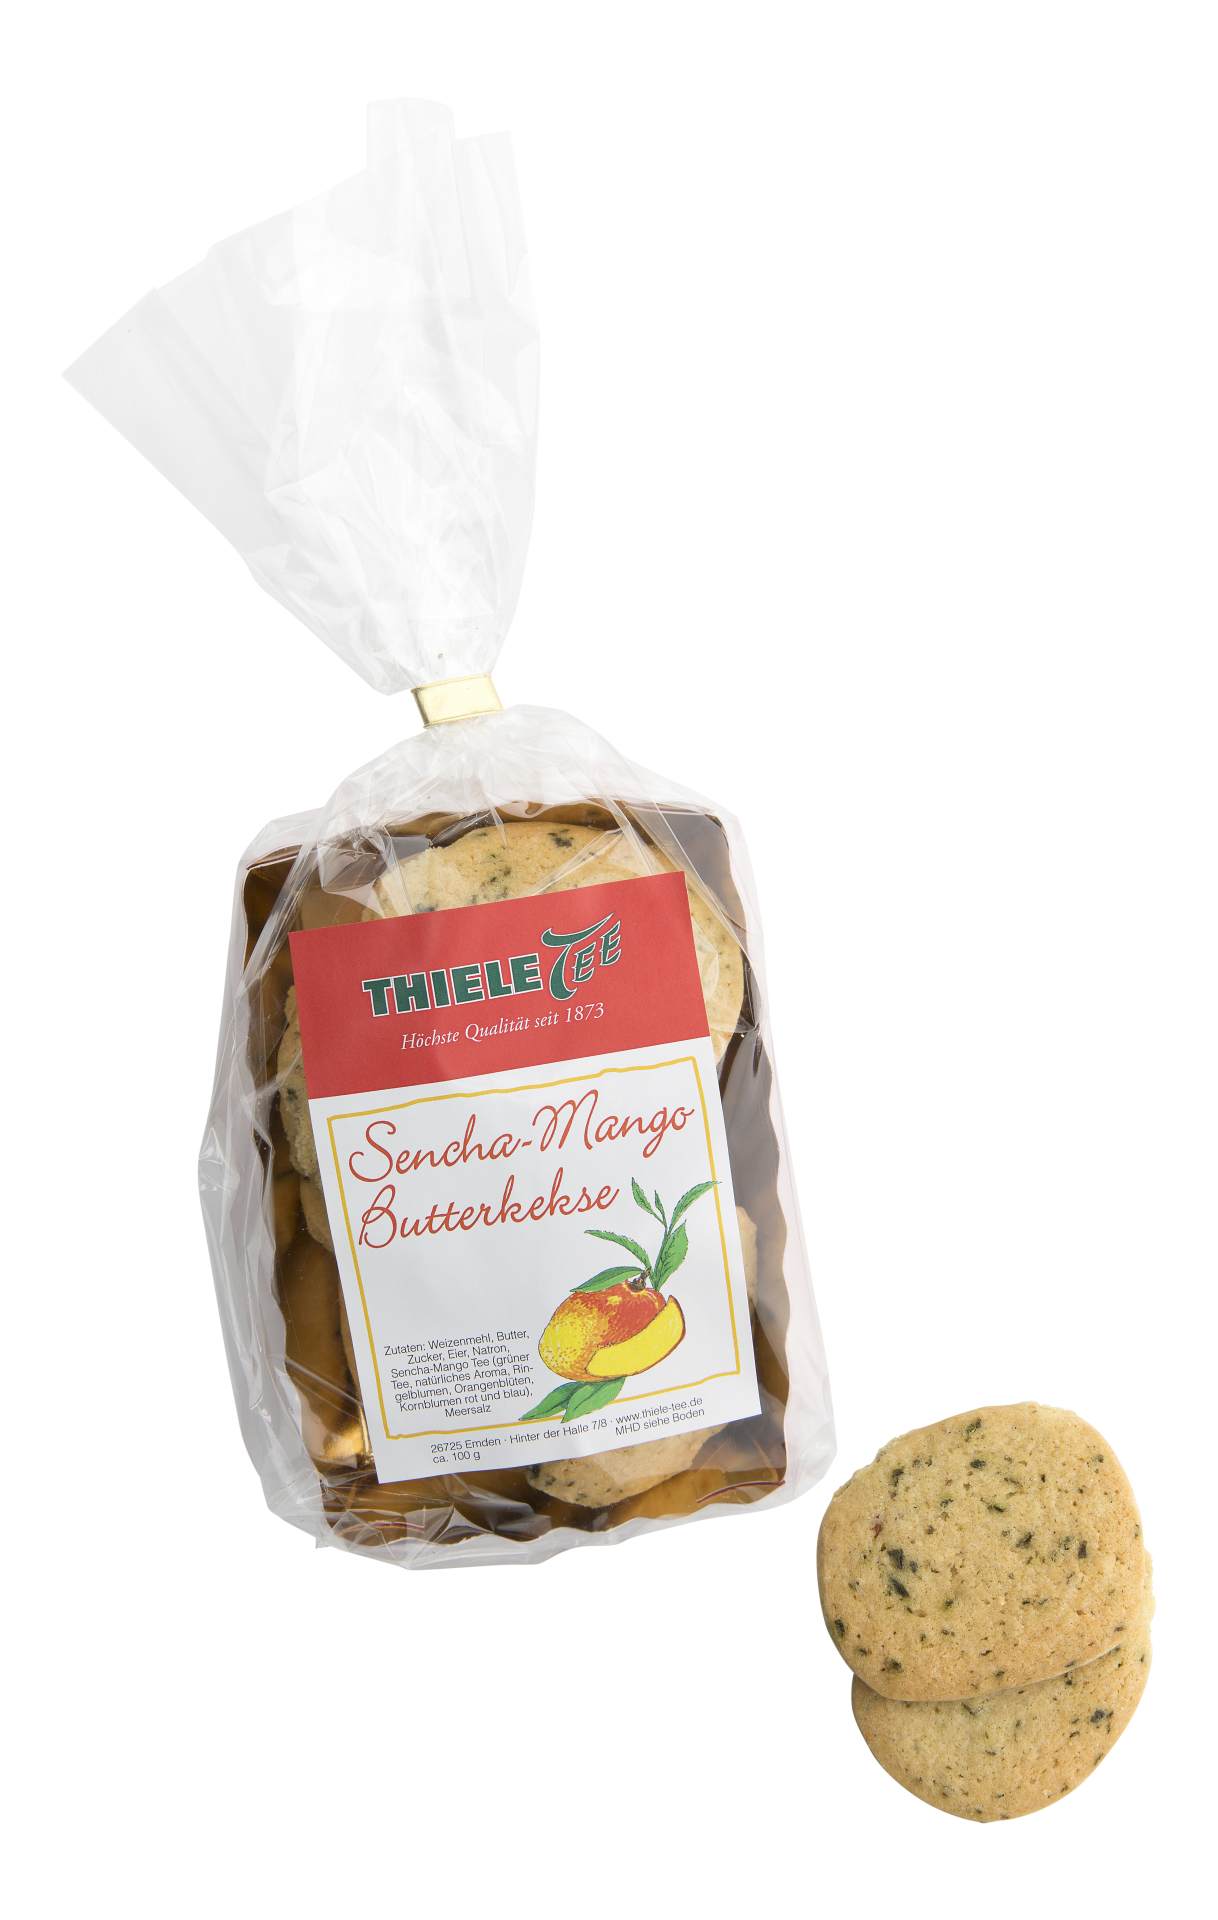 THIELE TEE Grüner Tee Sencha-Mango Kekse